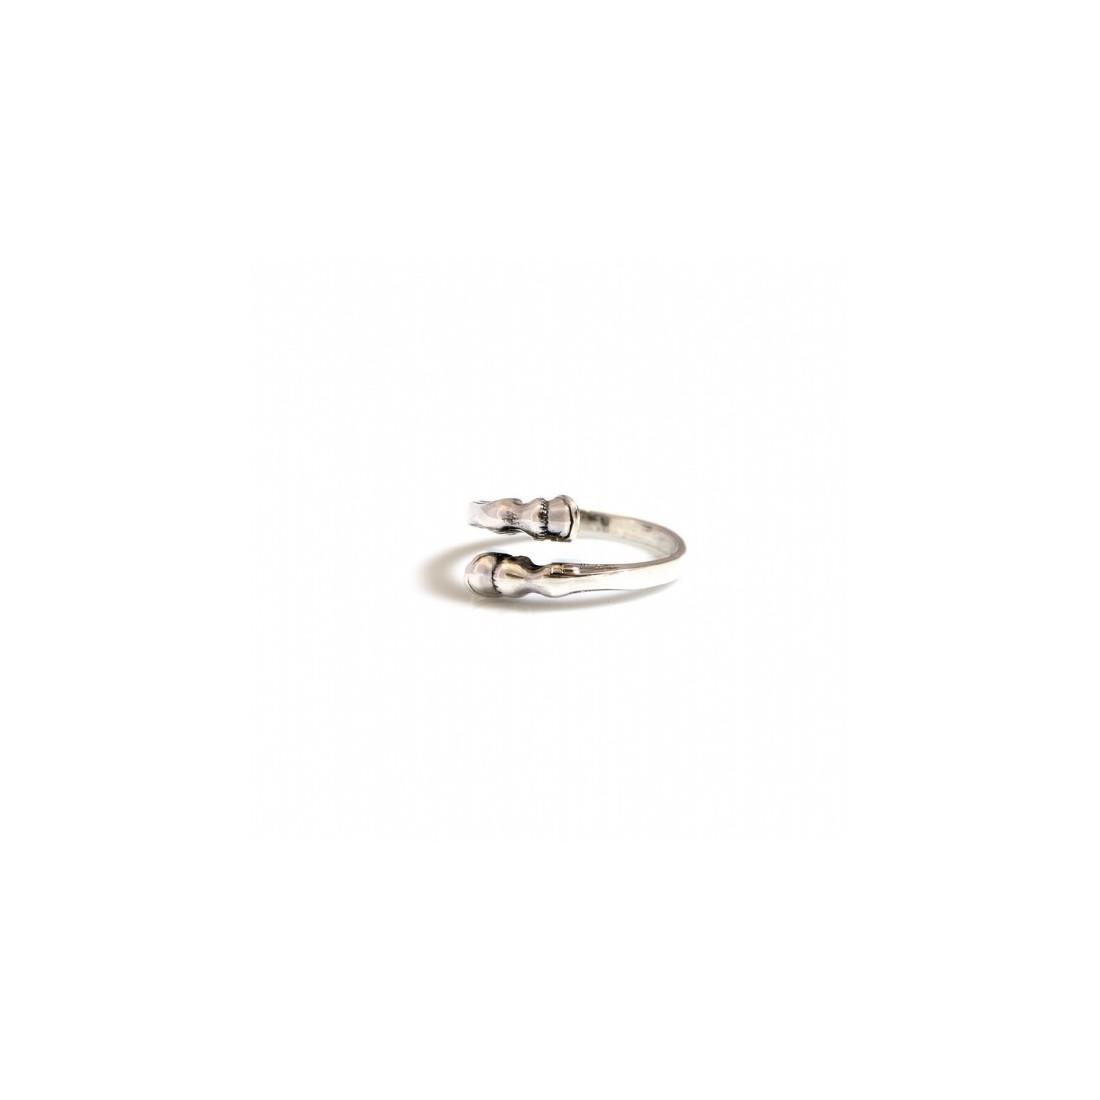 Sterling Silver Horse Hoof Adjustable Ring